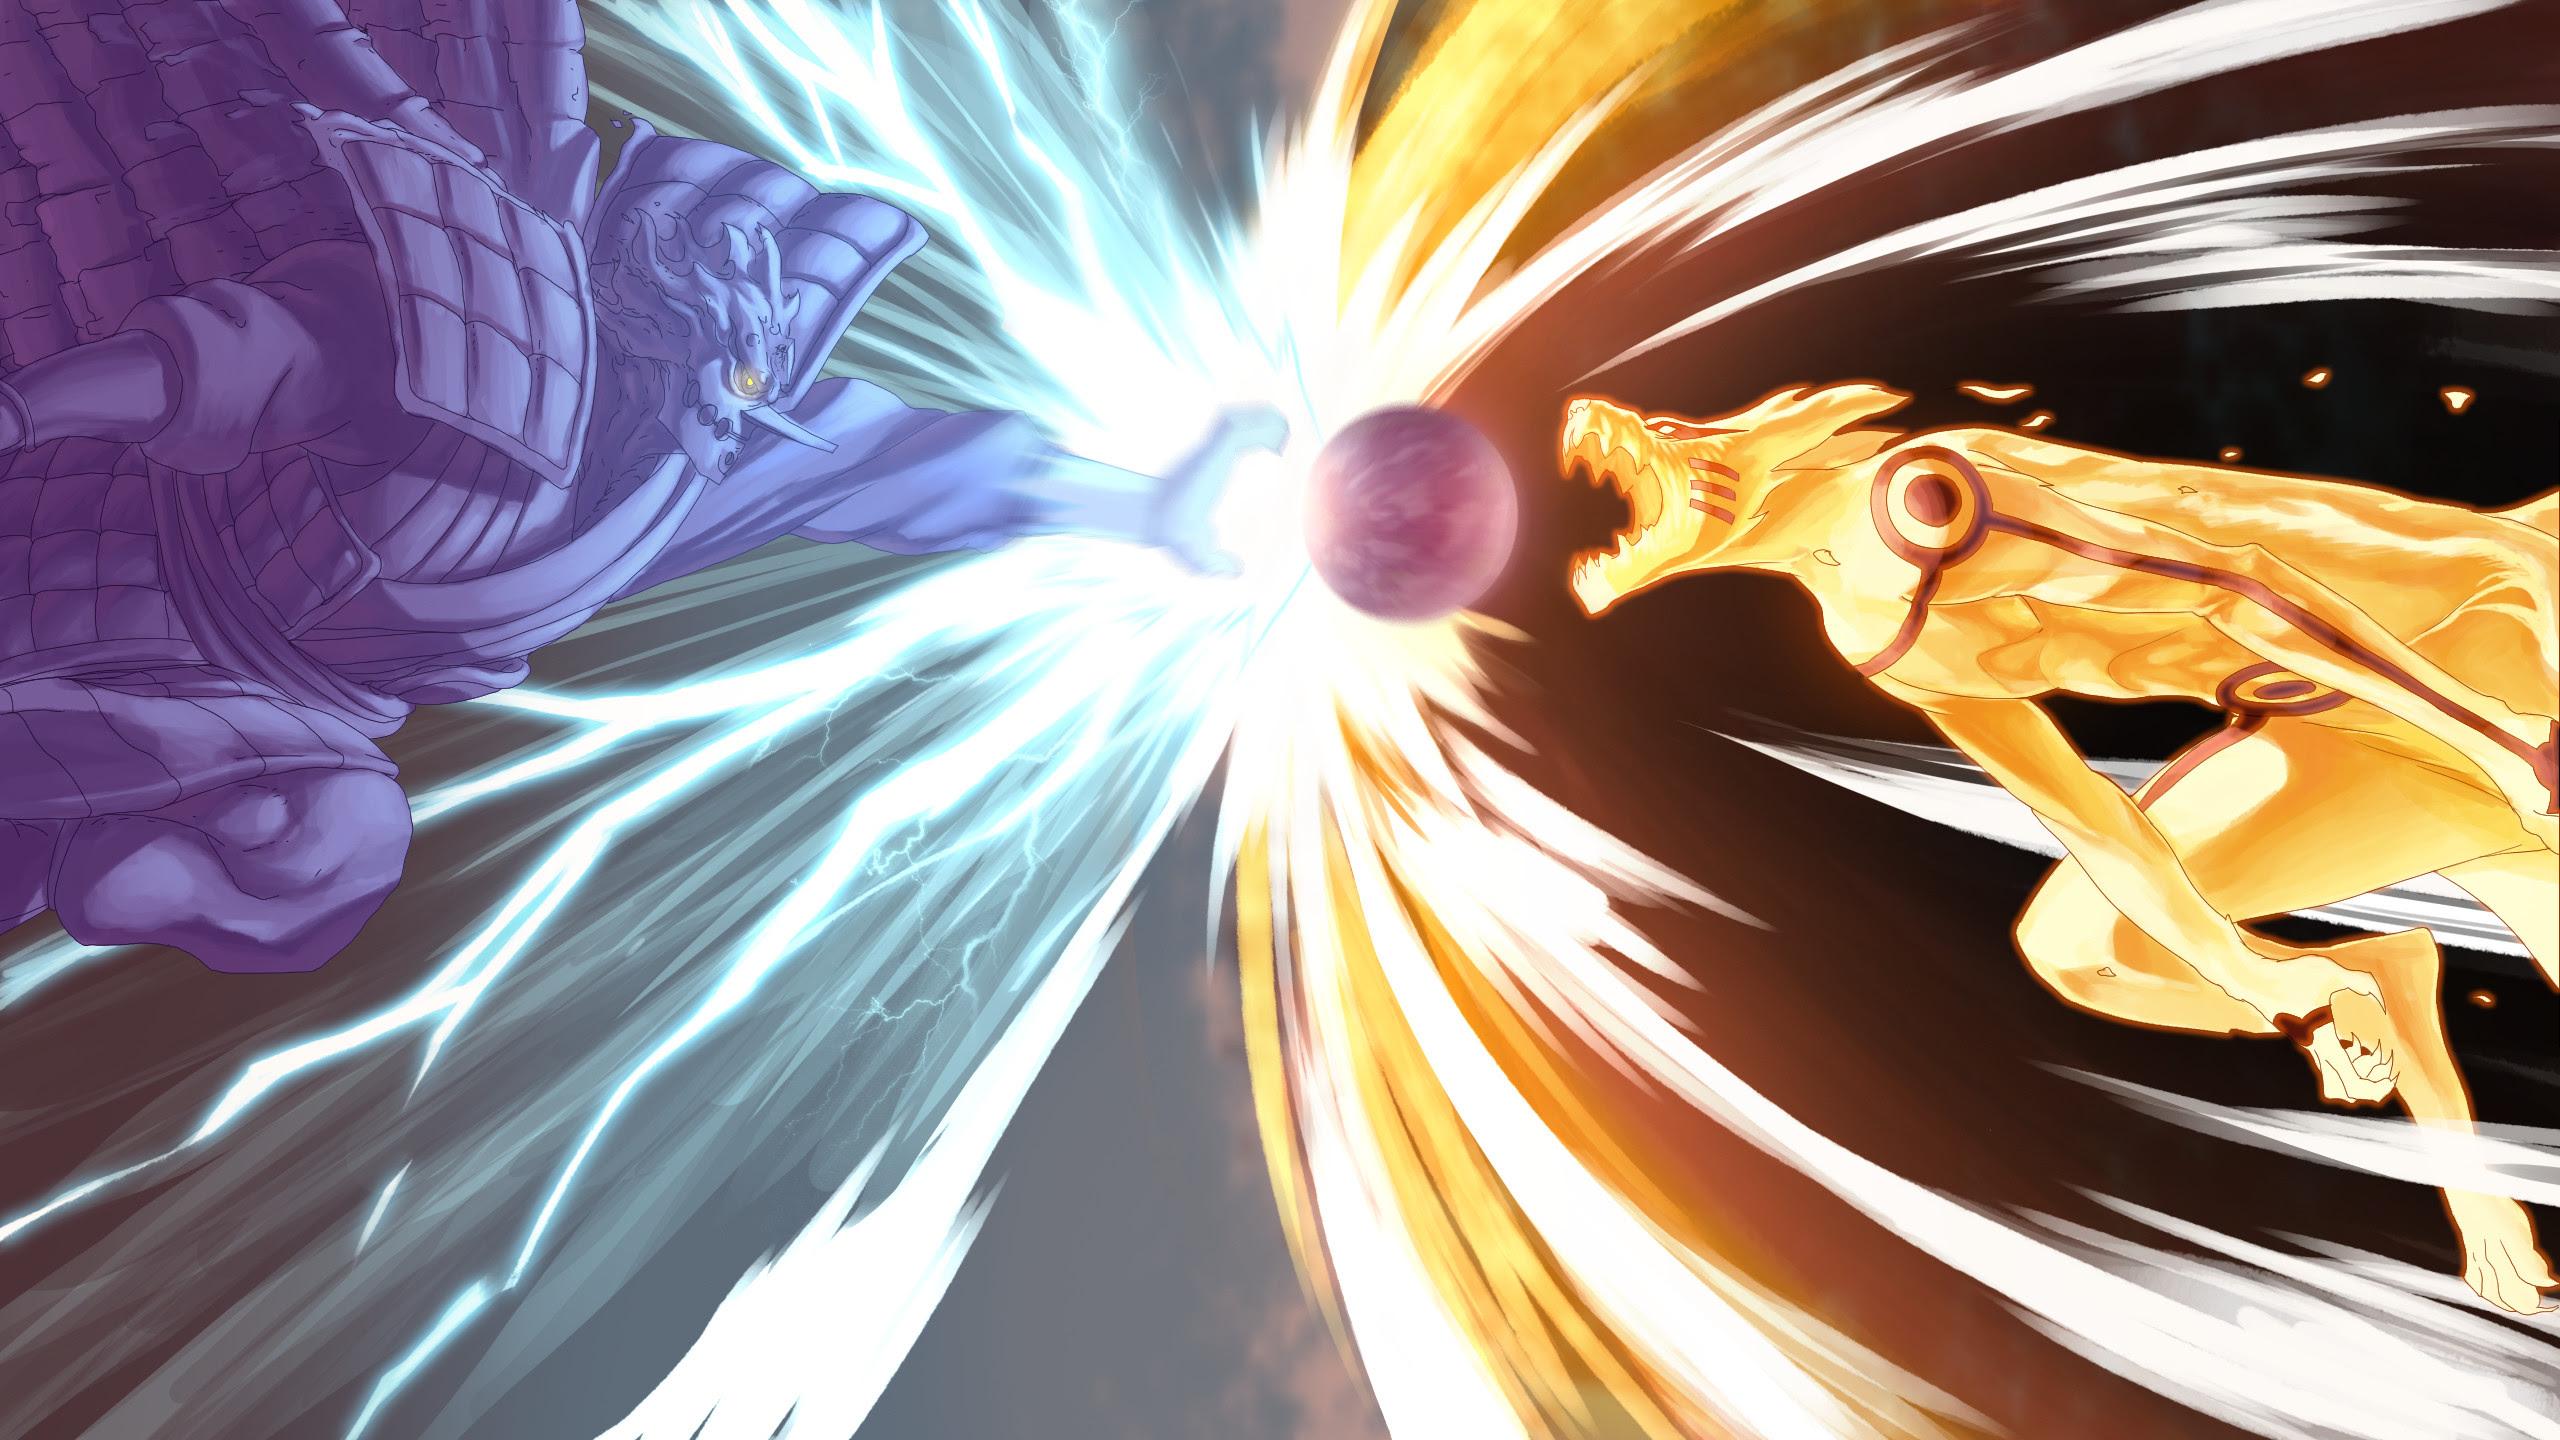 Naruto Fighting Wallpaper Hd